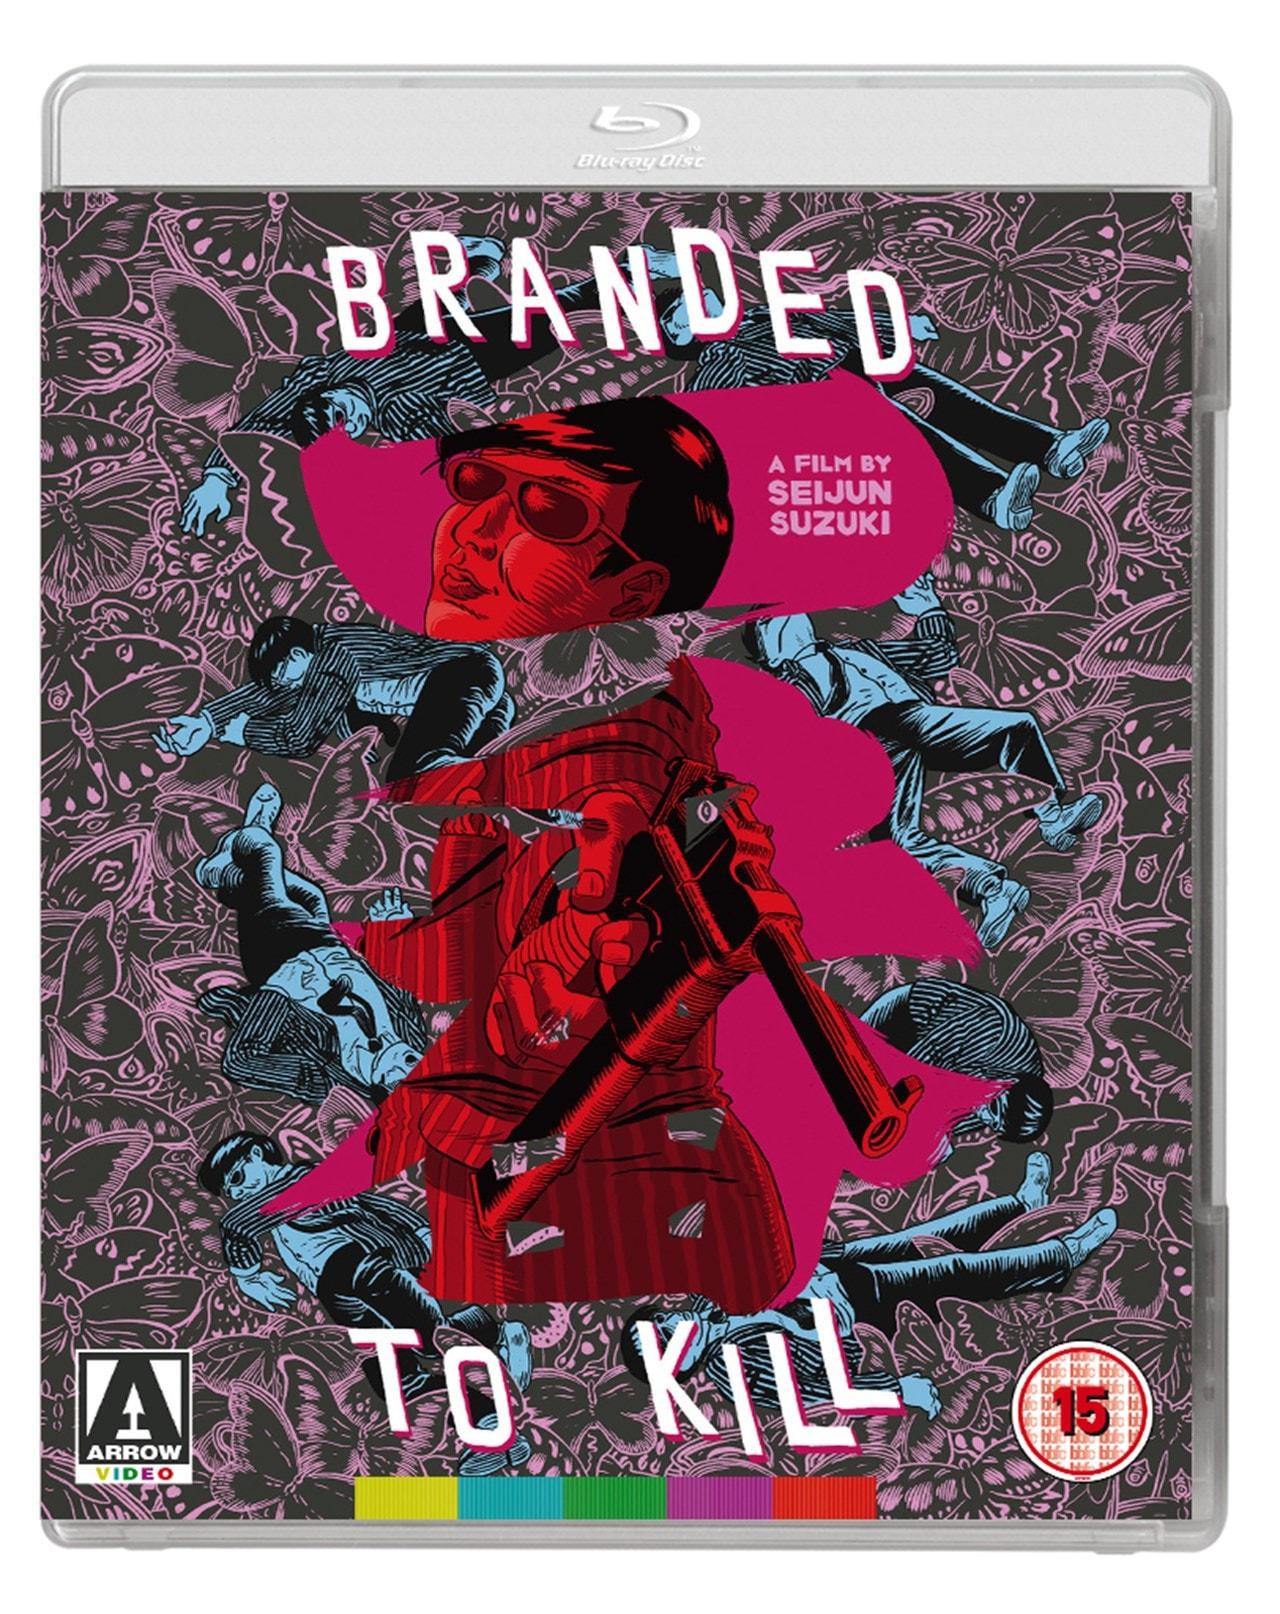 Branded to Kill - 1